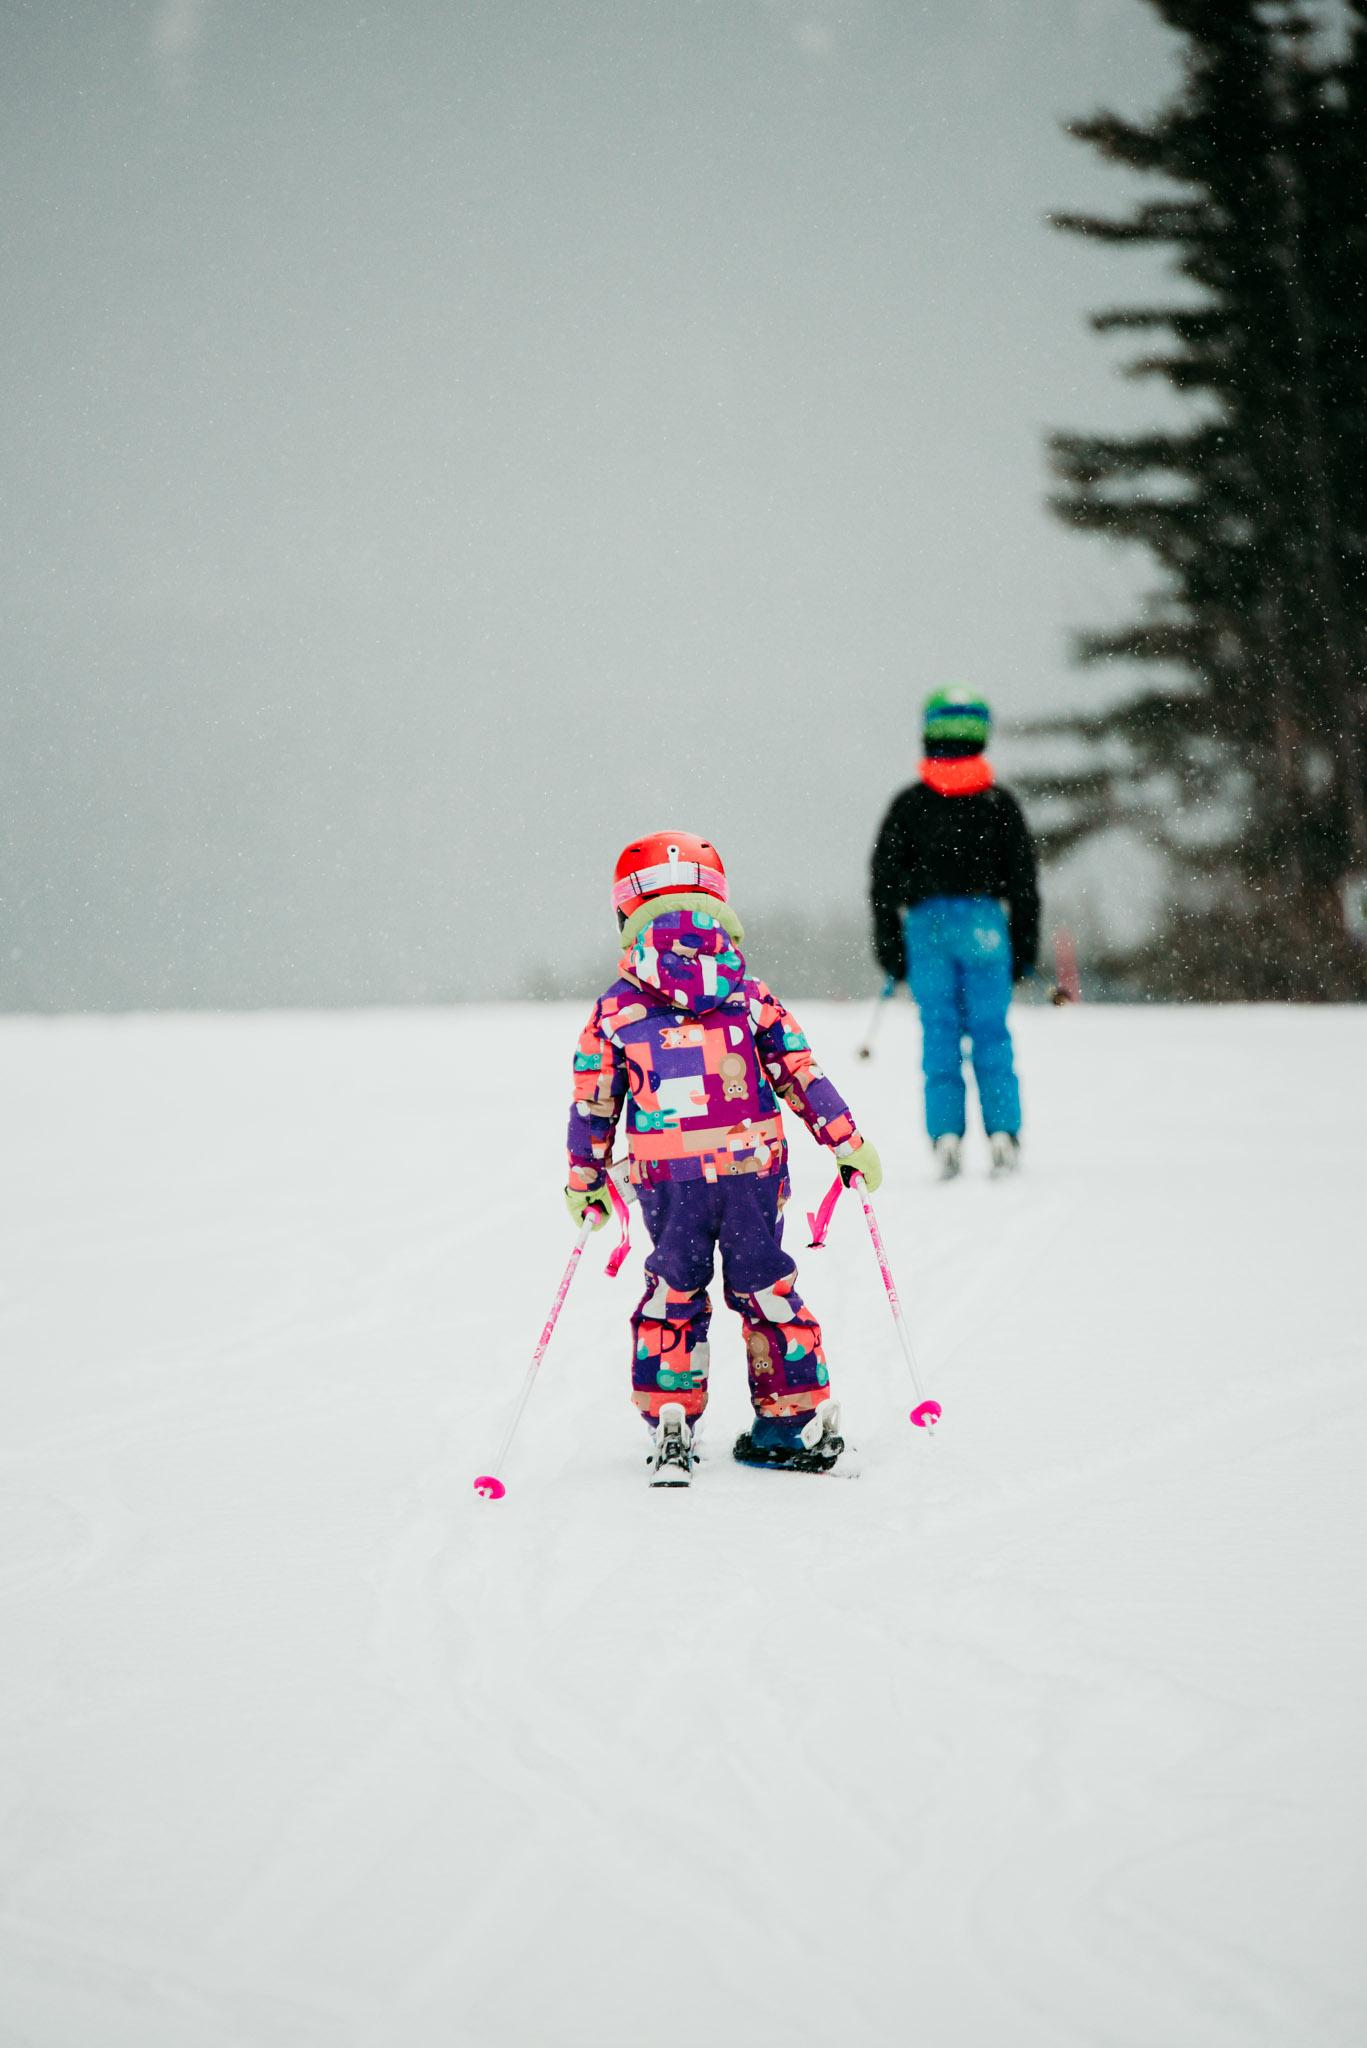 Chelsea Czibere - January 19, 2018 - Nakiska Ski Resort-23.jpg